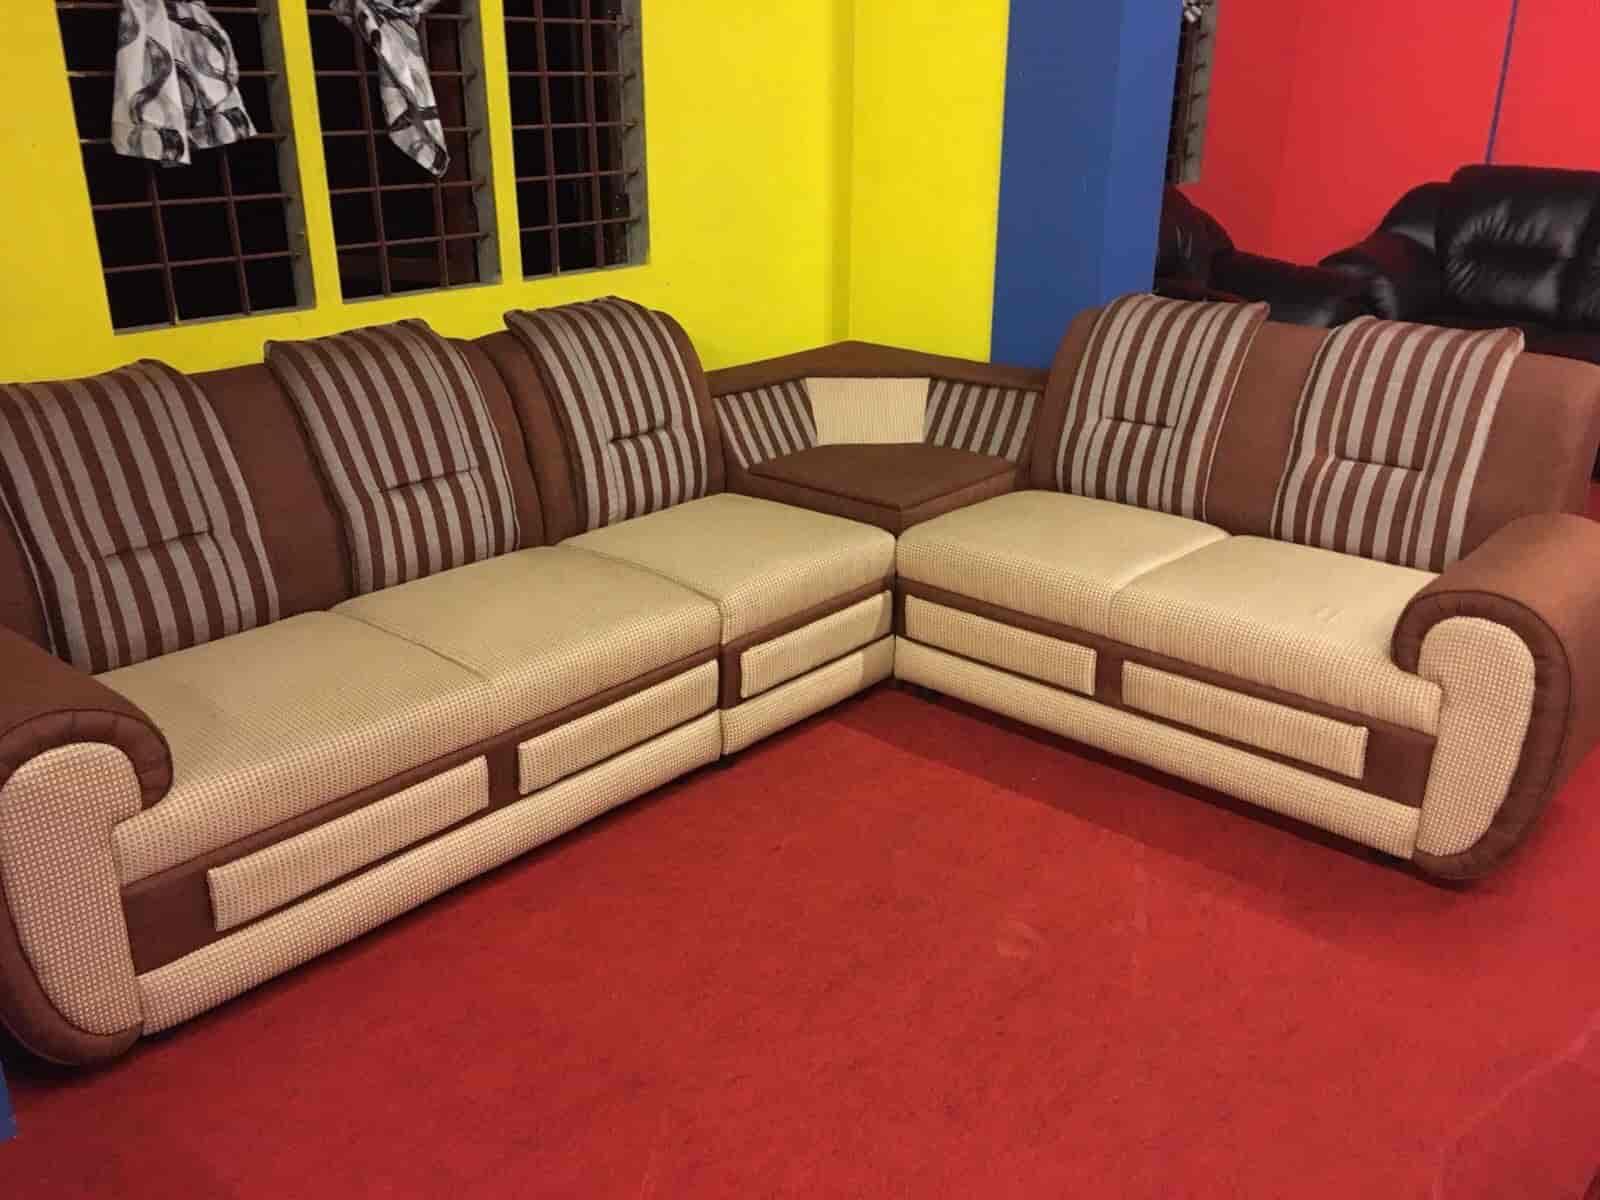 Peachy Riya Furniture Edapally Furniture Dealers In Ernakulam Machost Co Dining Chair Design Ideas Machostcouk